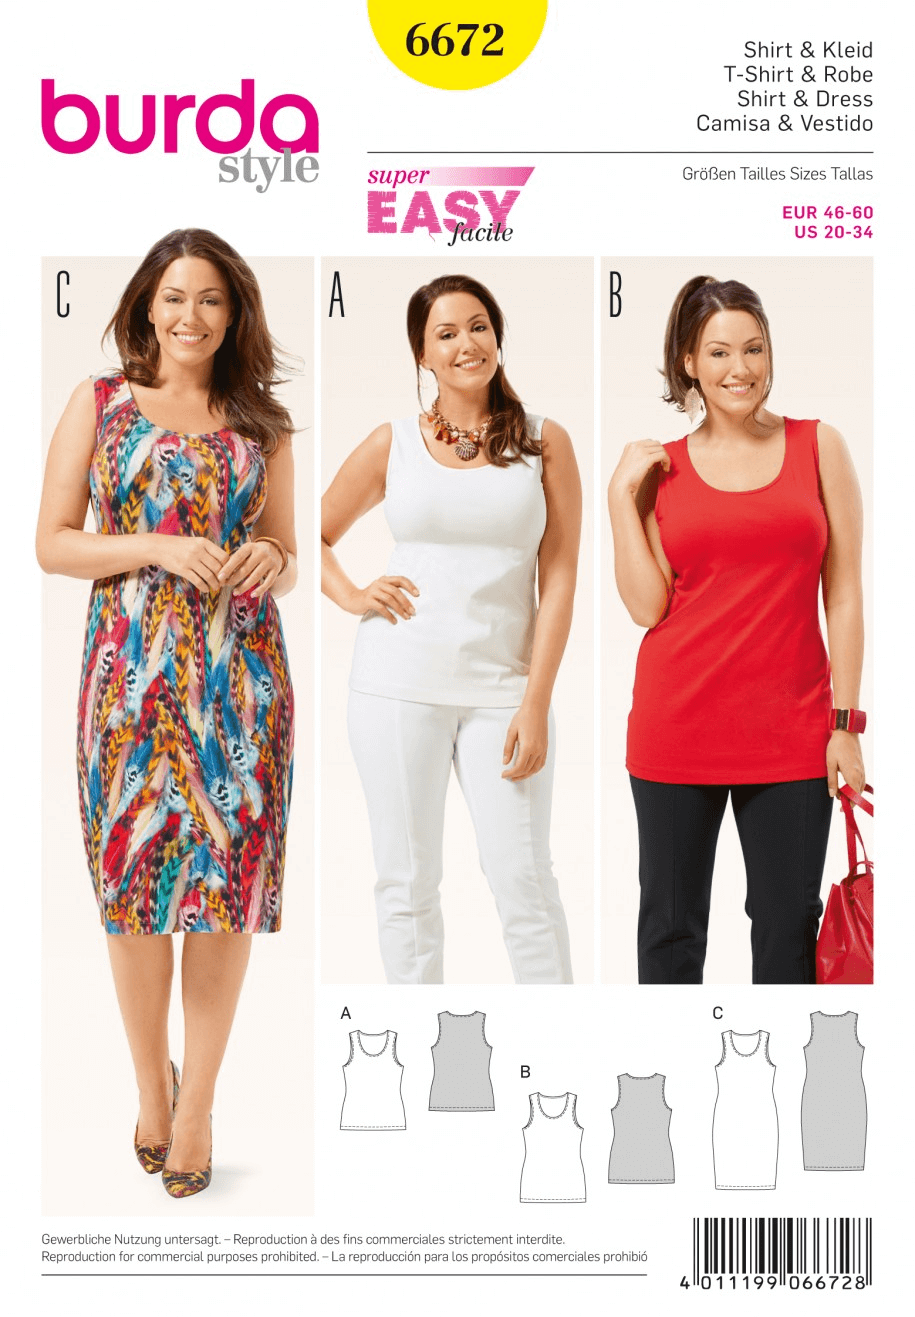 Misses Regular or Longline Vest Top and Jersey Dress Burda Sewing Pattern 6672